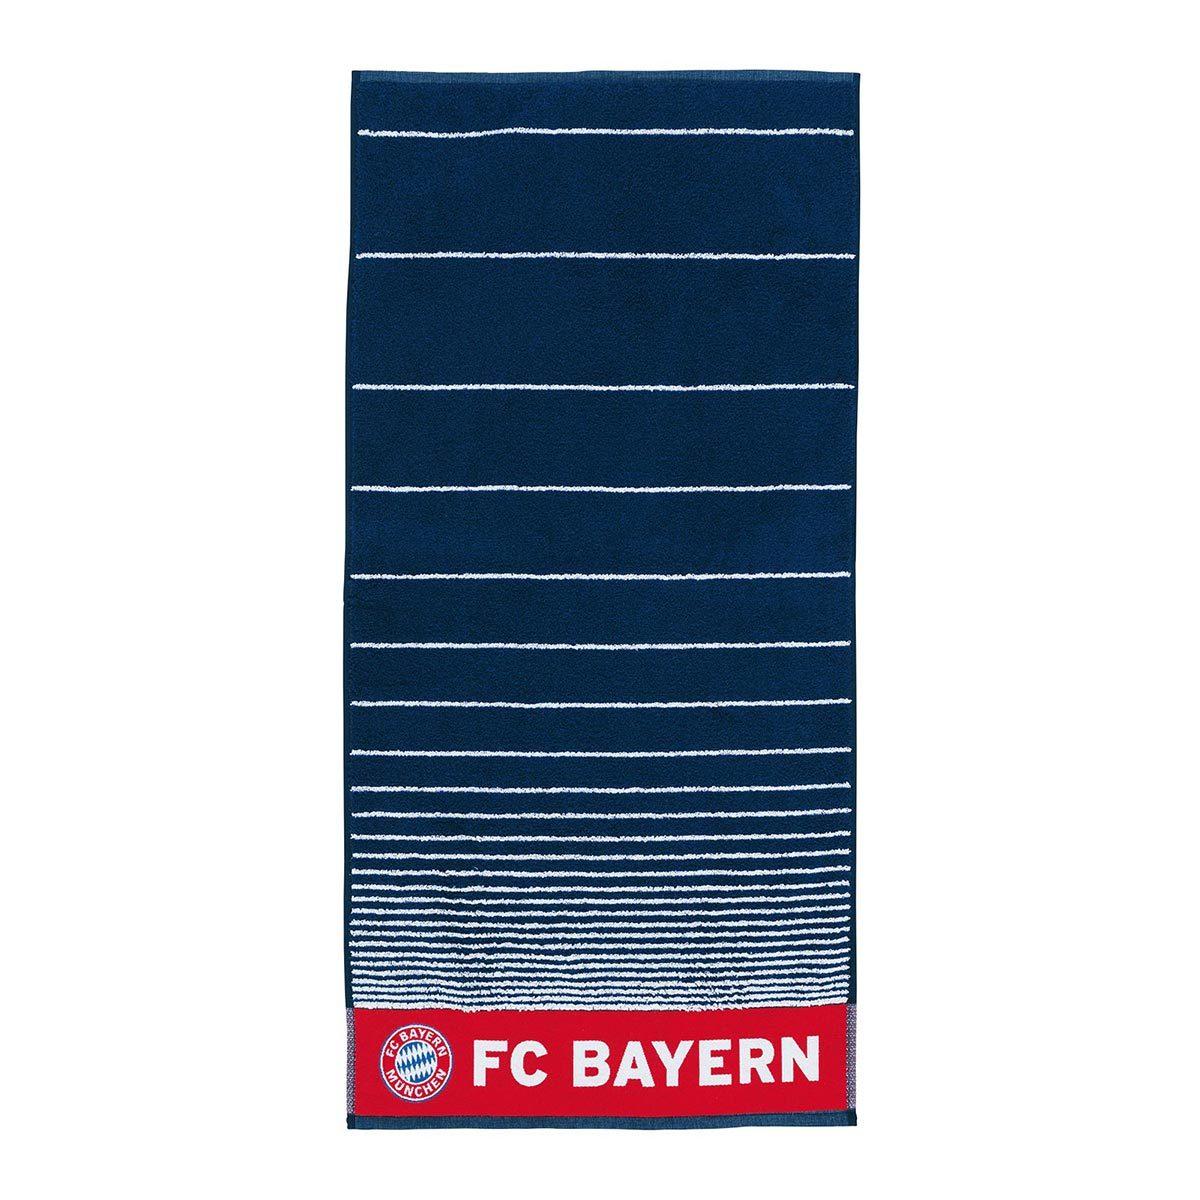 FC Bayern München Handtücher navy